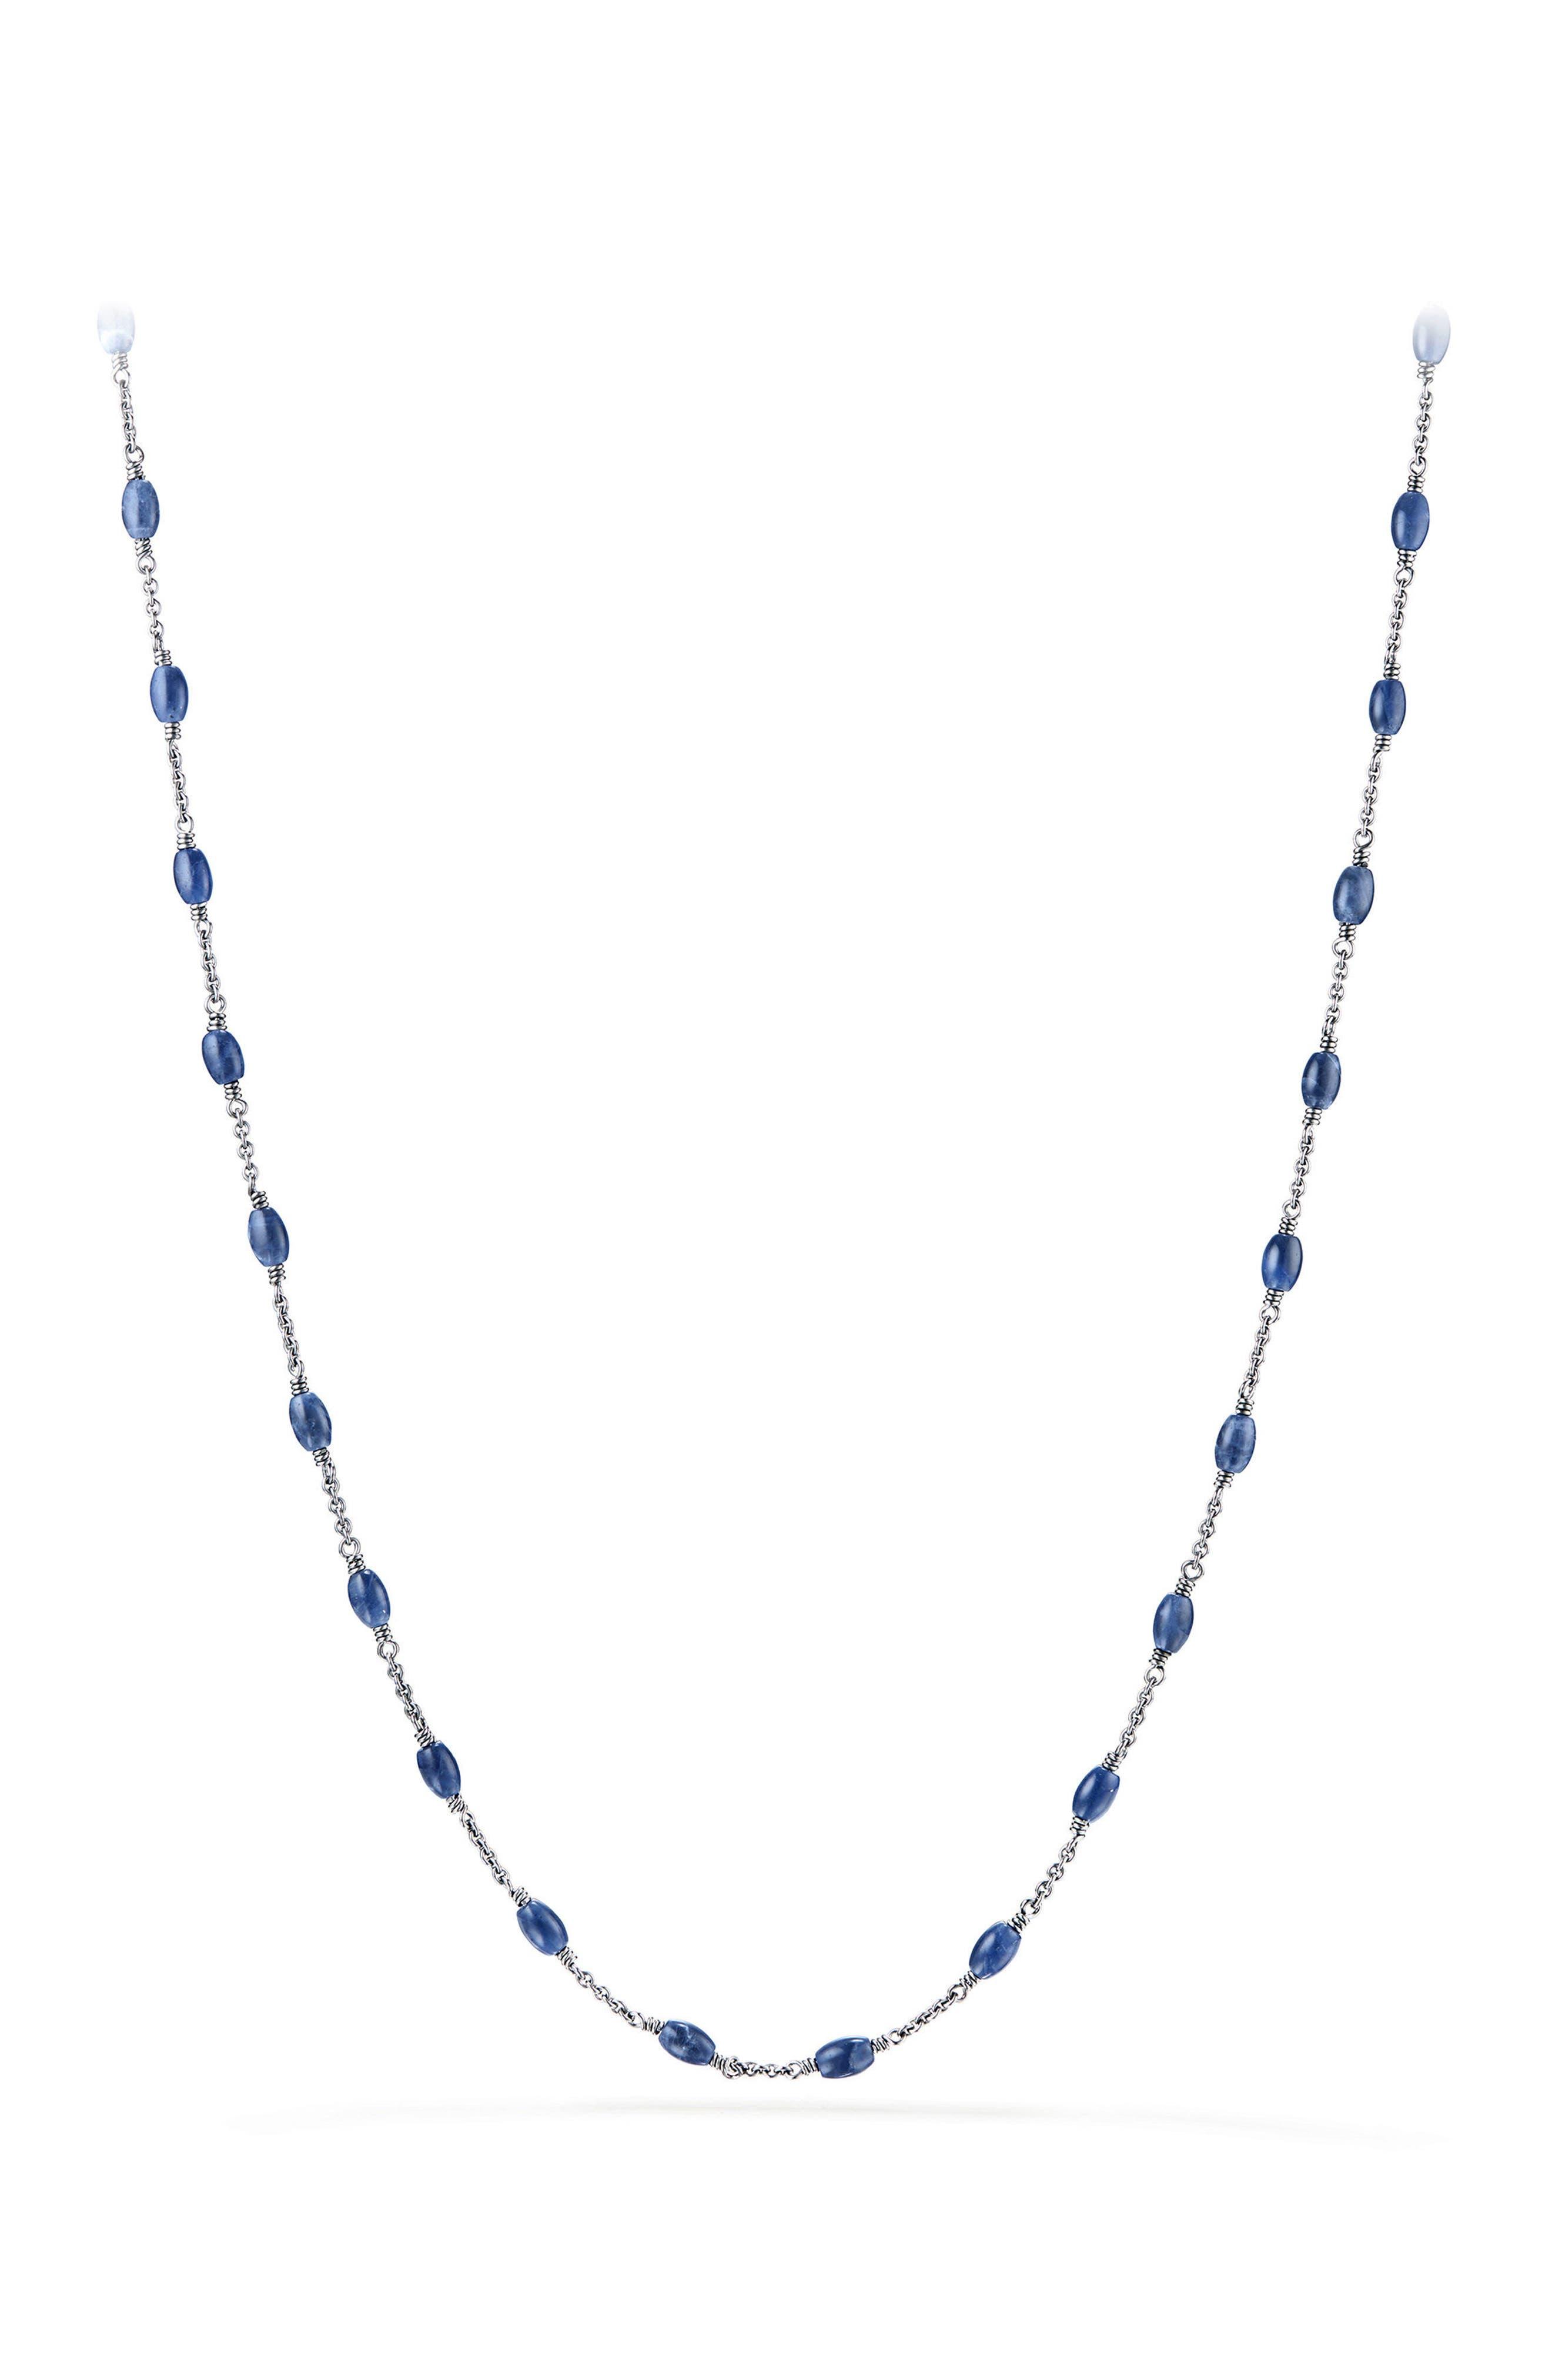 Spiritual Beads Necklace,                         Main,                         color, Sodalite